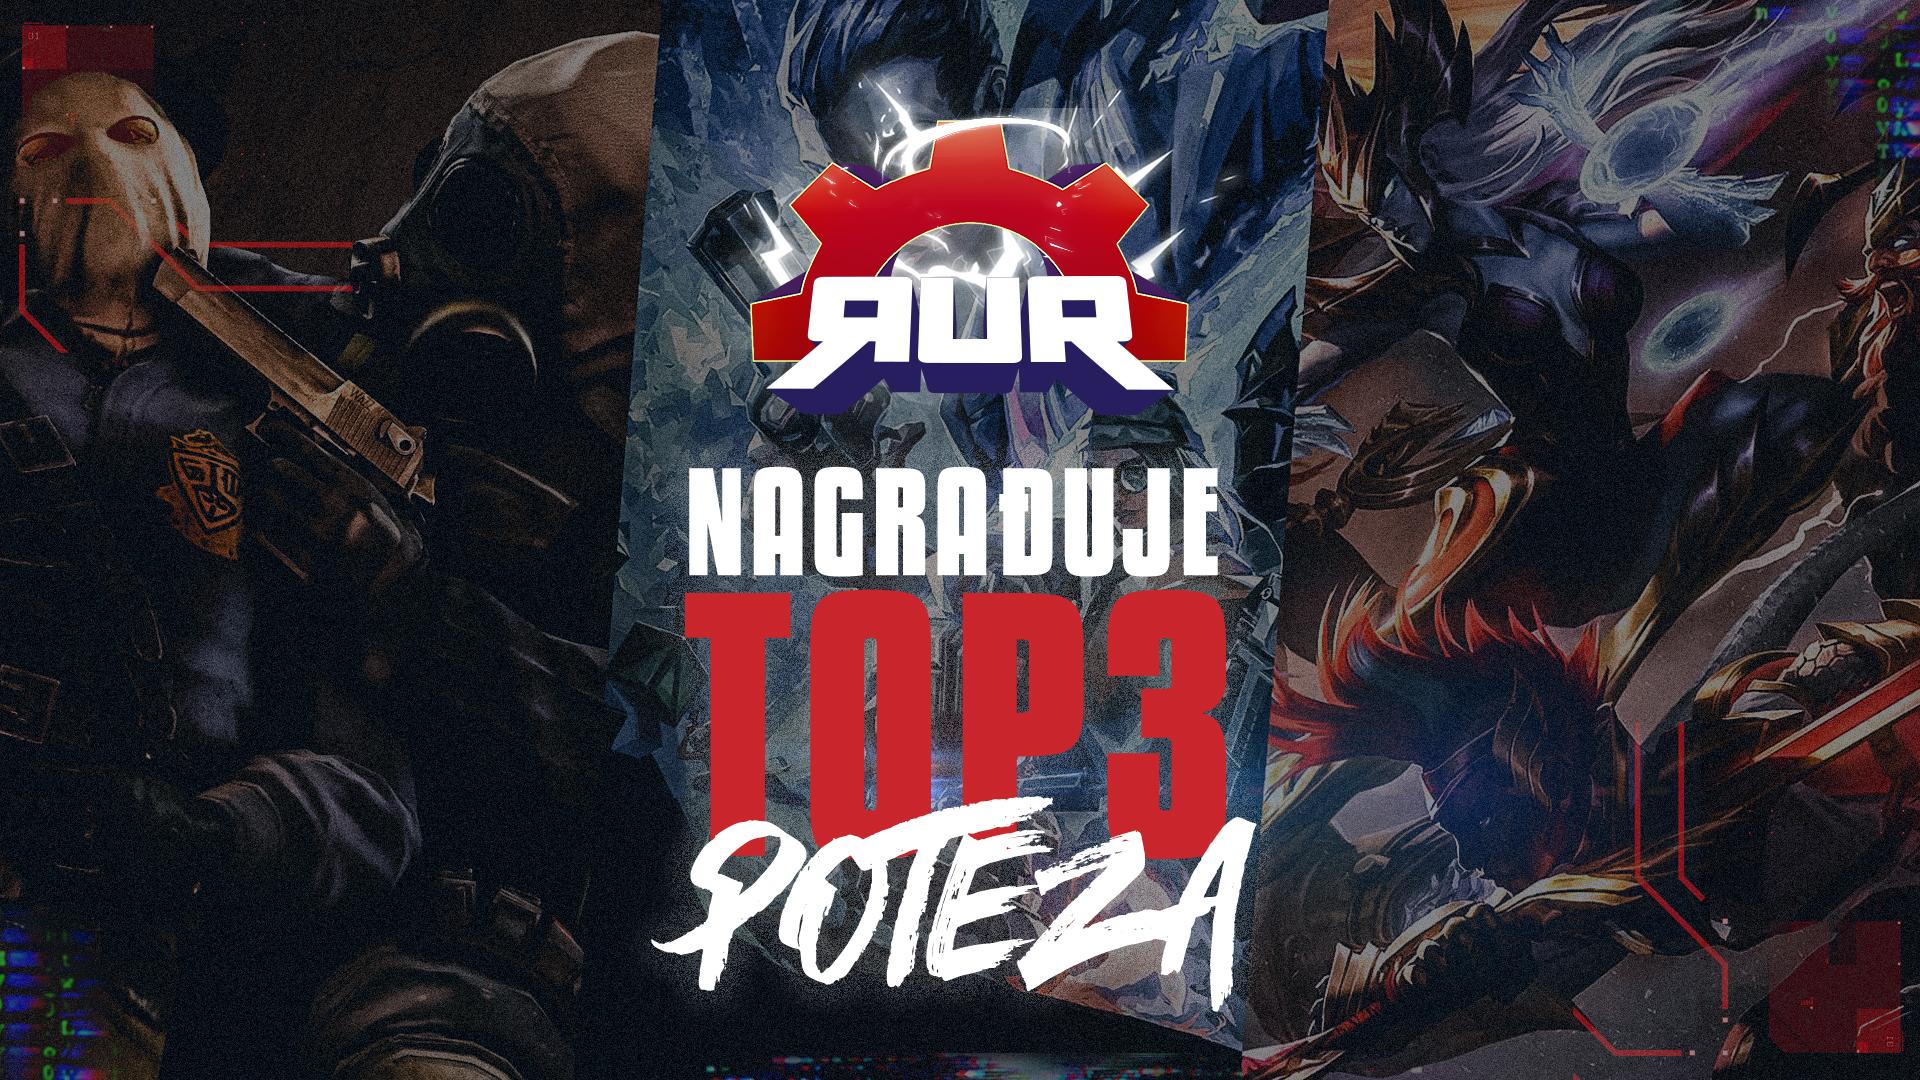 rur-top3-poteza